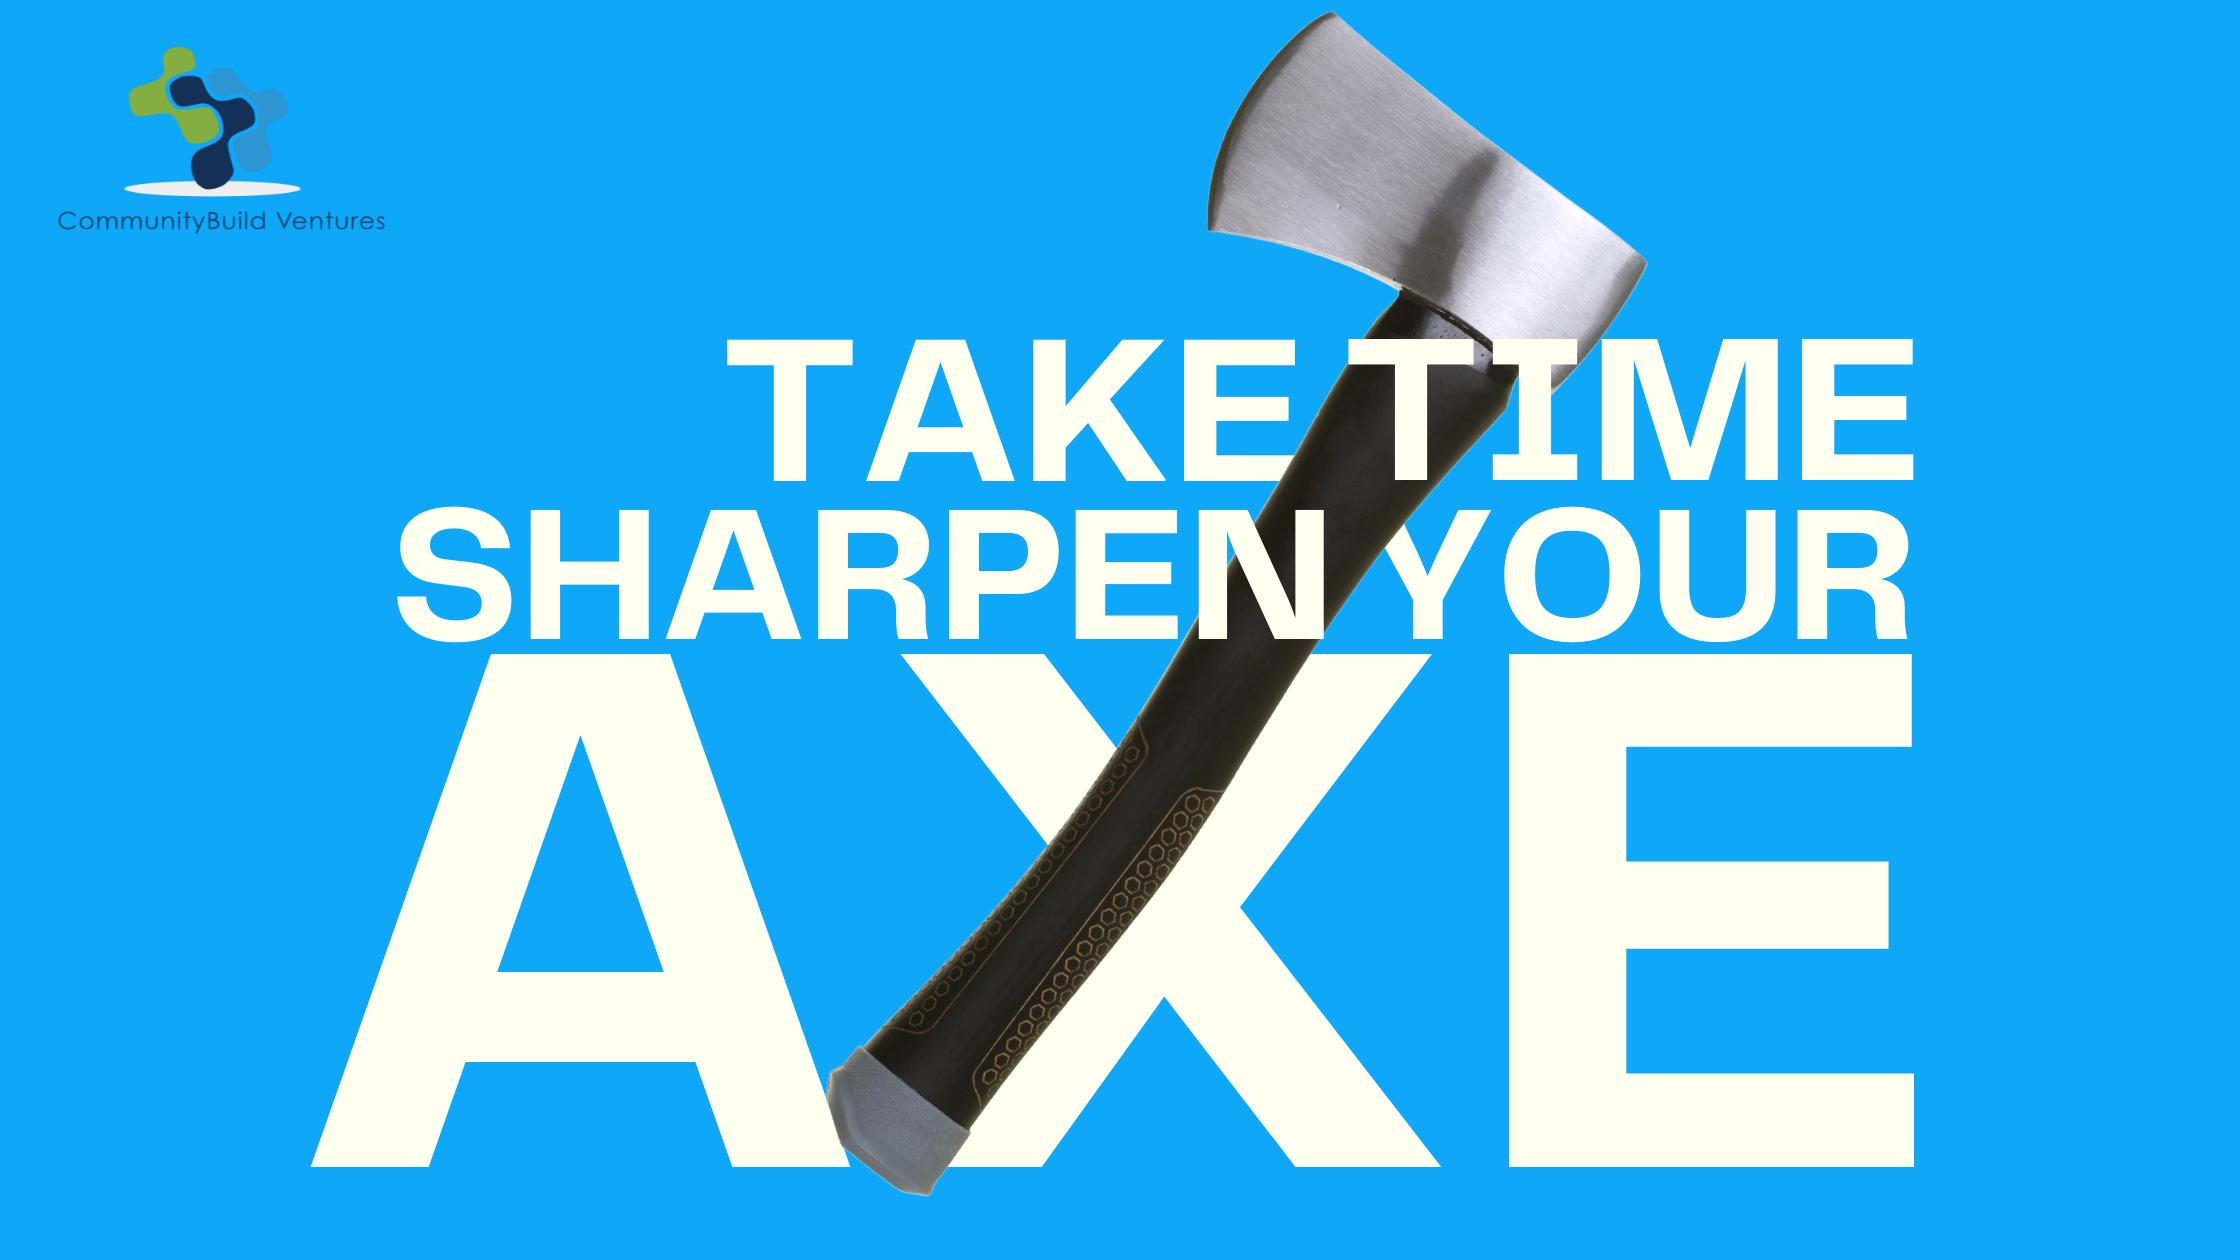 Take Time Sharpen Your Axe